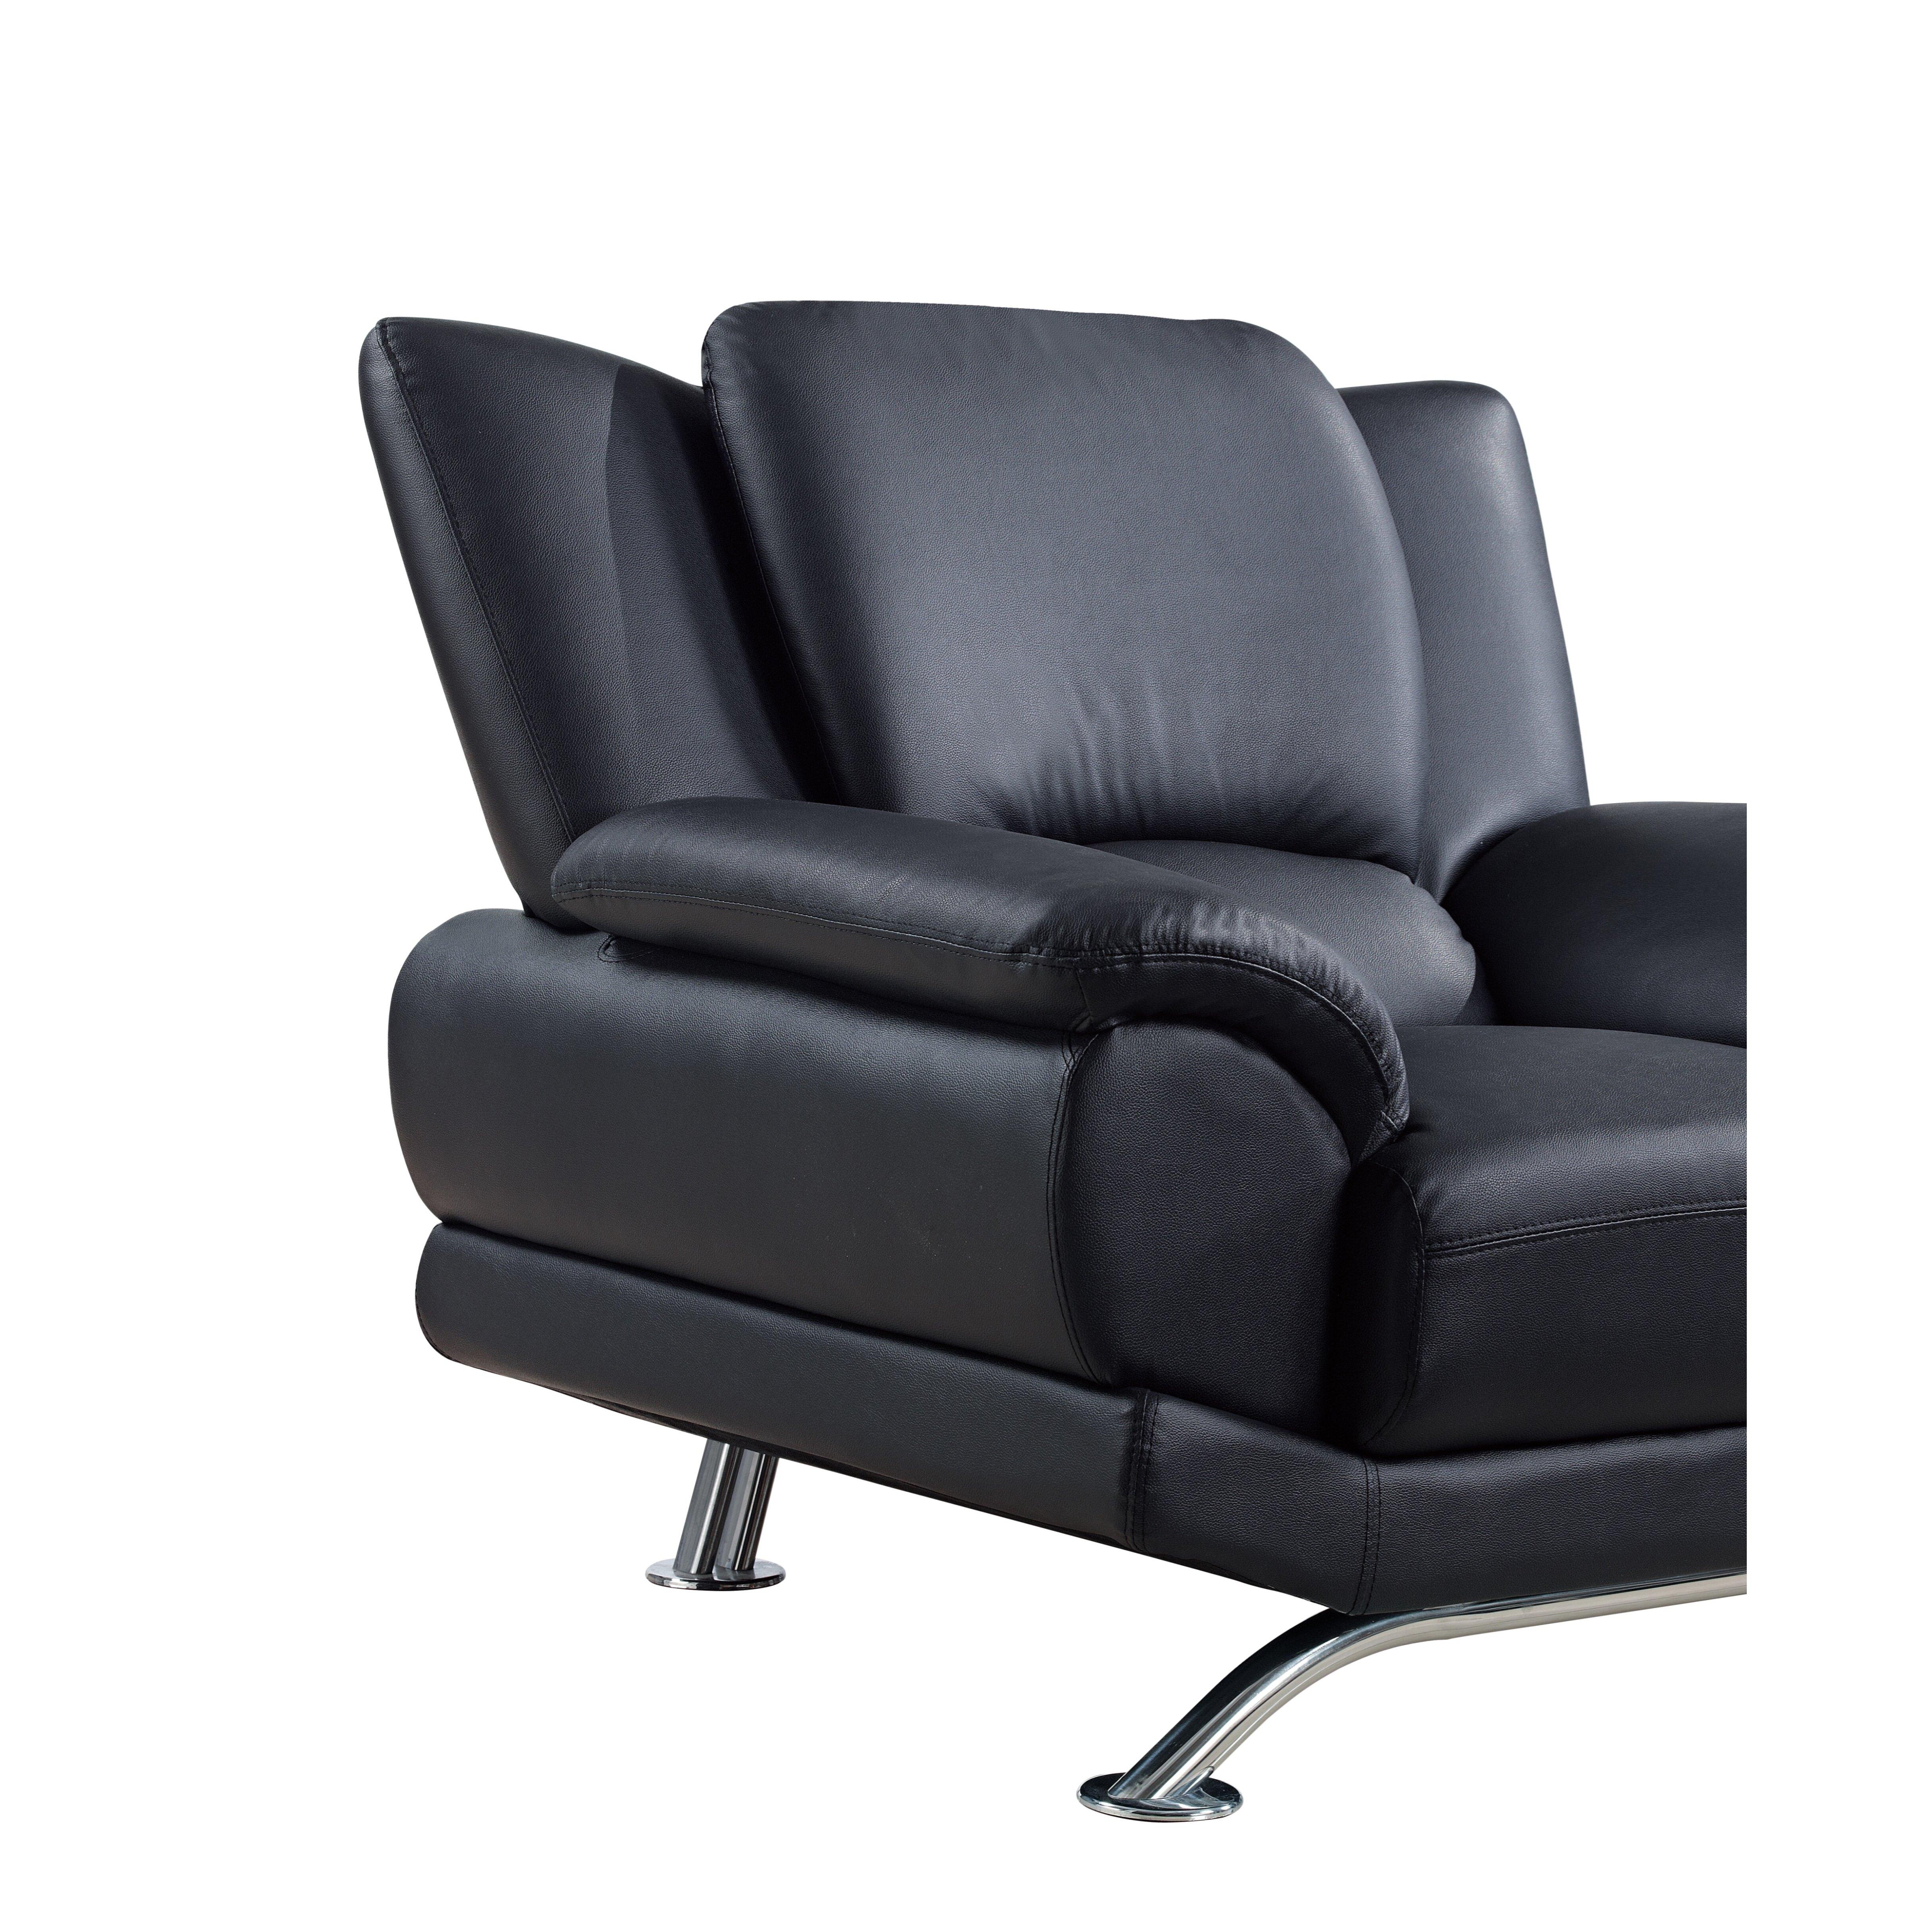 Global furniture usa arm chair wayfair for Furniture usa